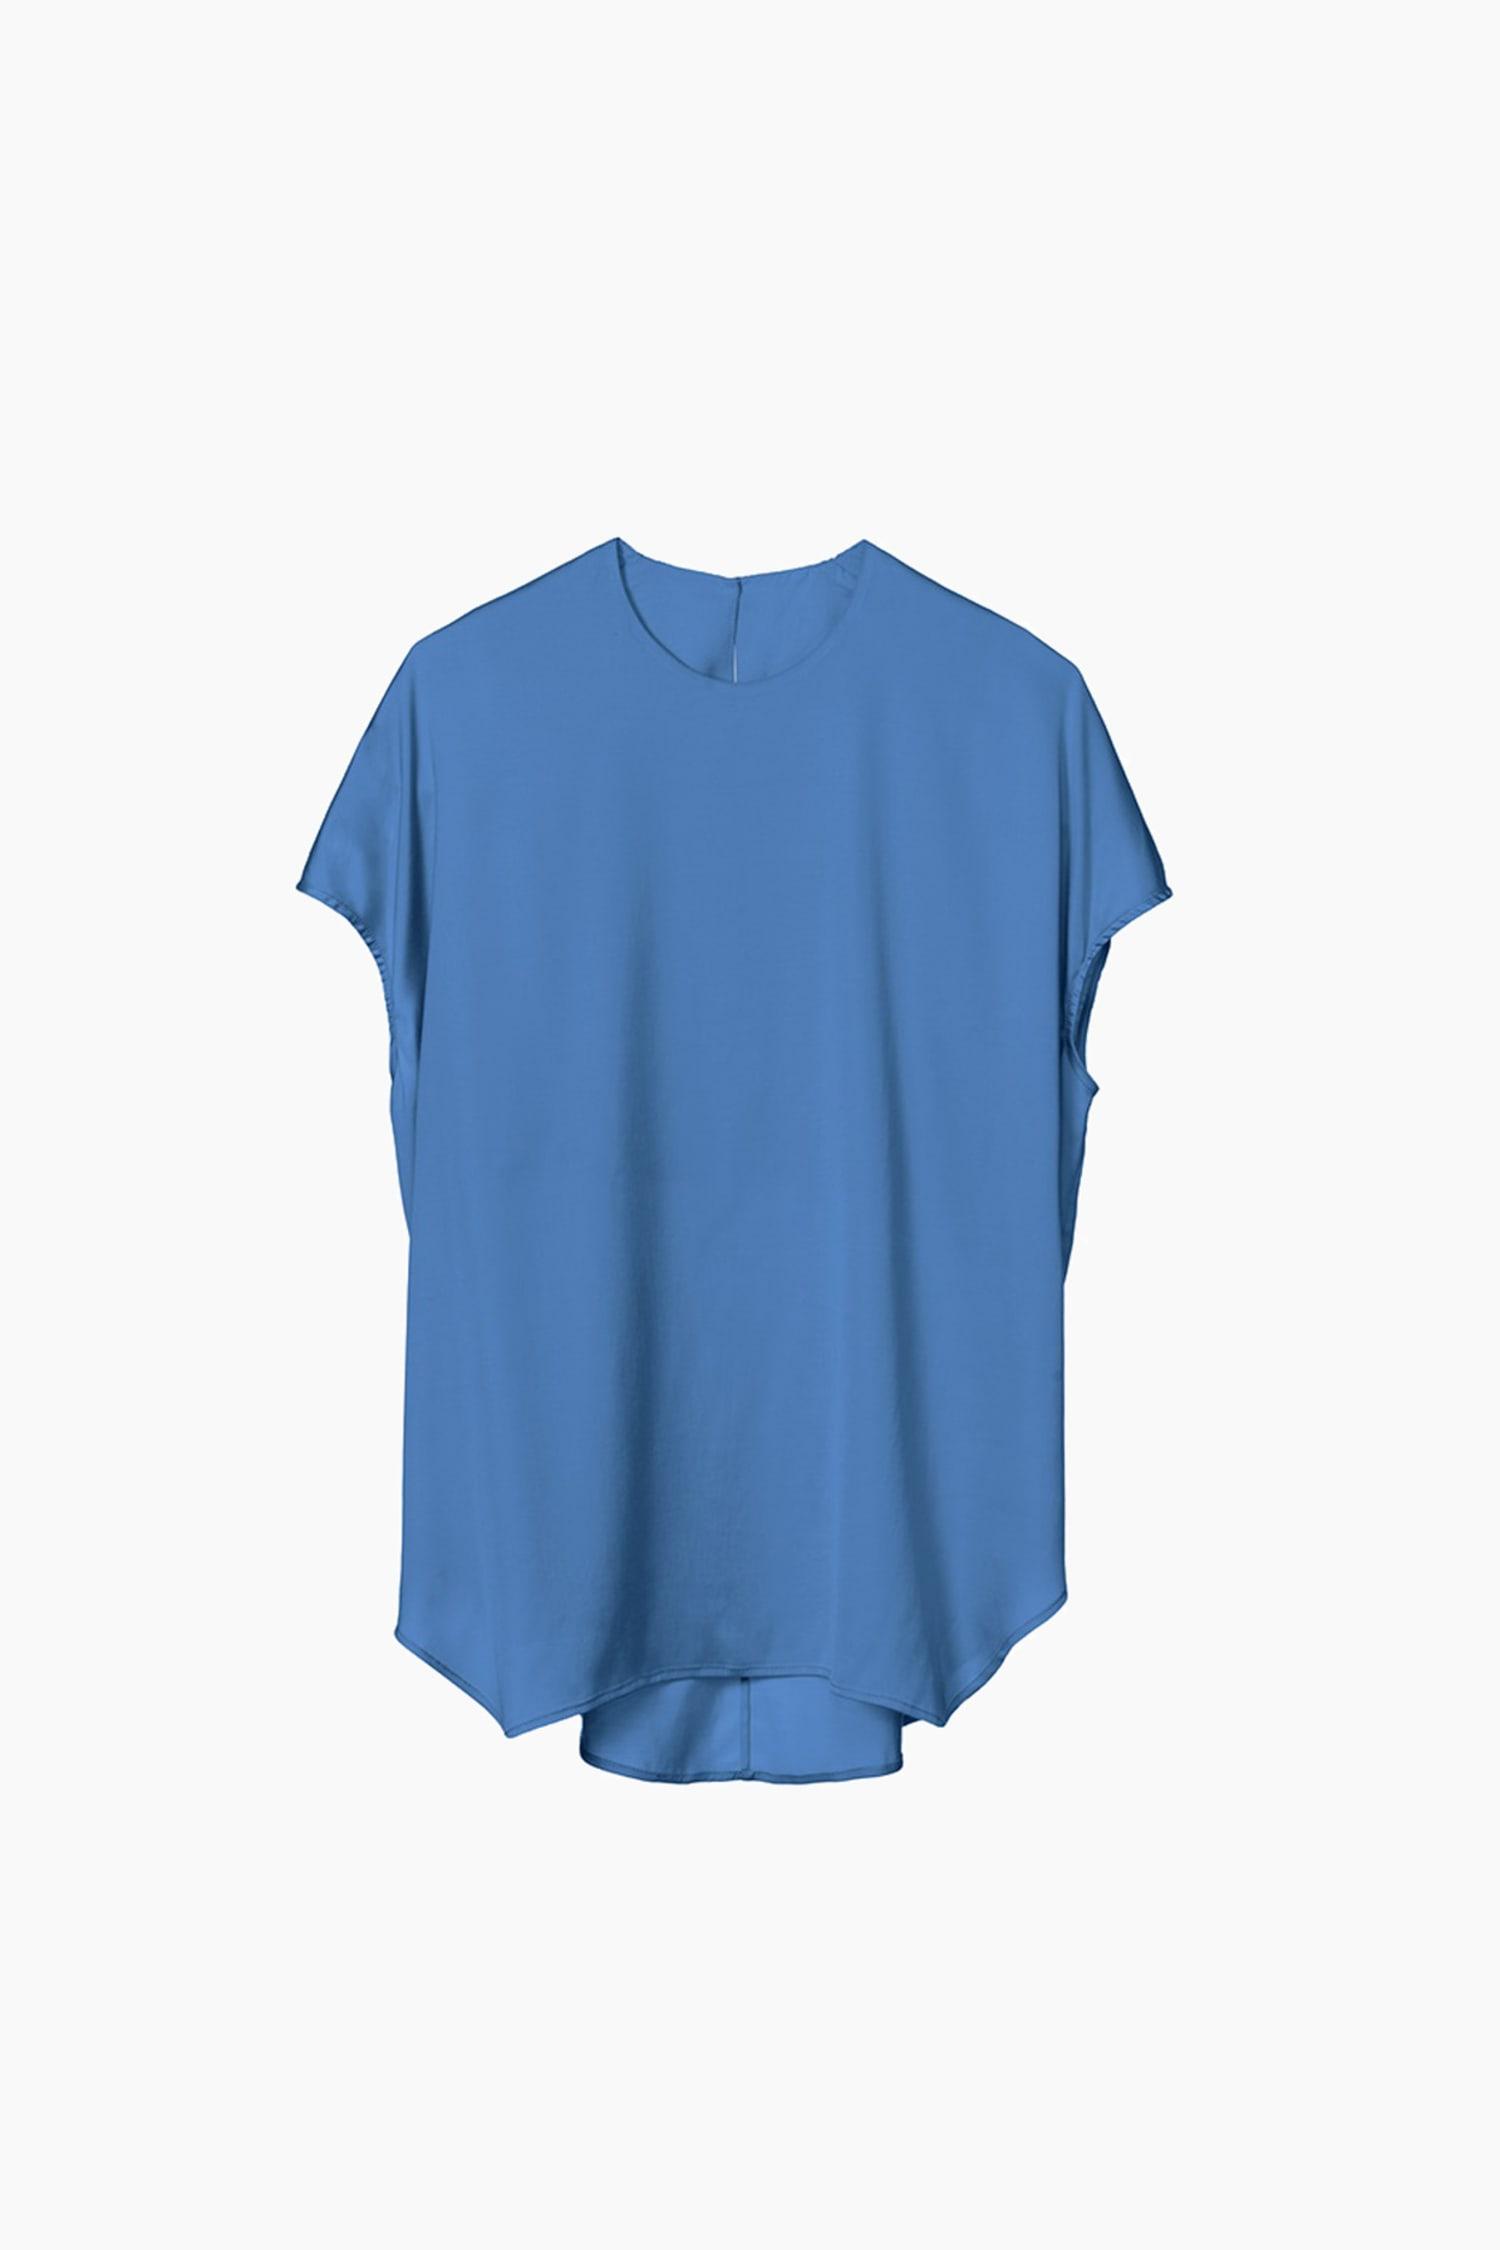 Didion cornflower blue mmfleur cornflower blue 110 izmirmasajfo